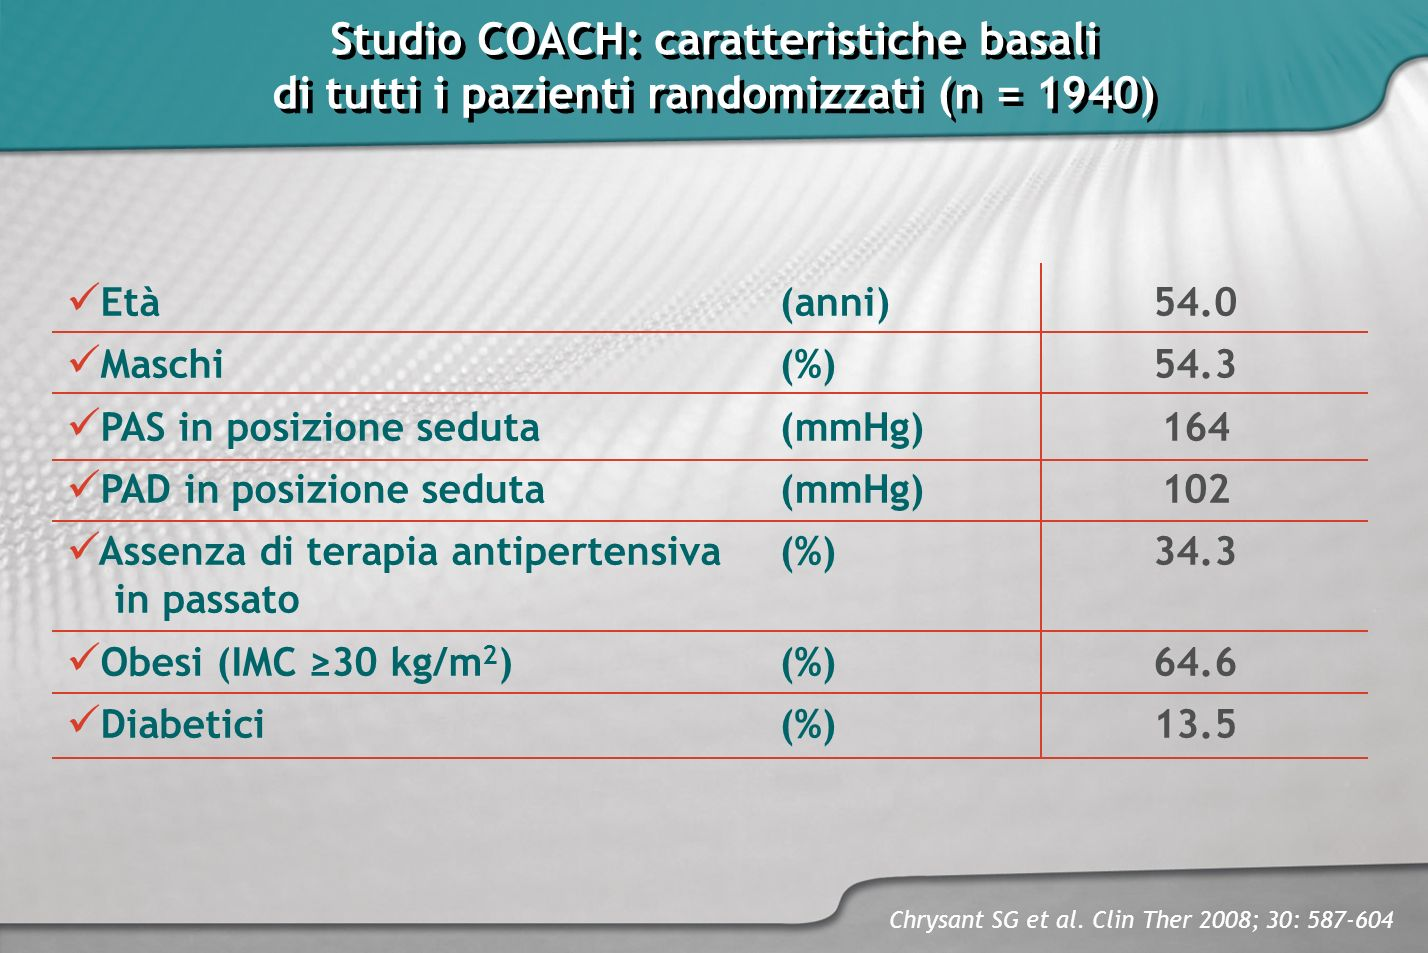 Studio COACH: caratteristiche basali di tutti i pazienti randomizzati (n = 1940) Studio COACH: caratteristiche basali di tutti i pazienti randomizzati